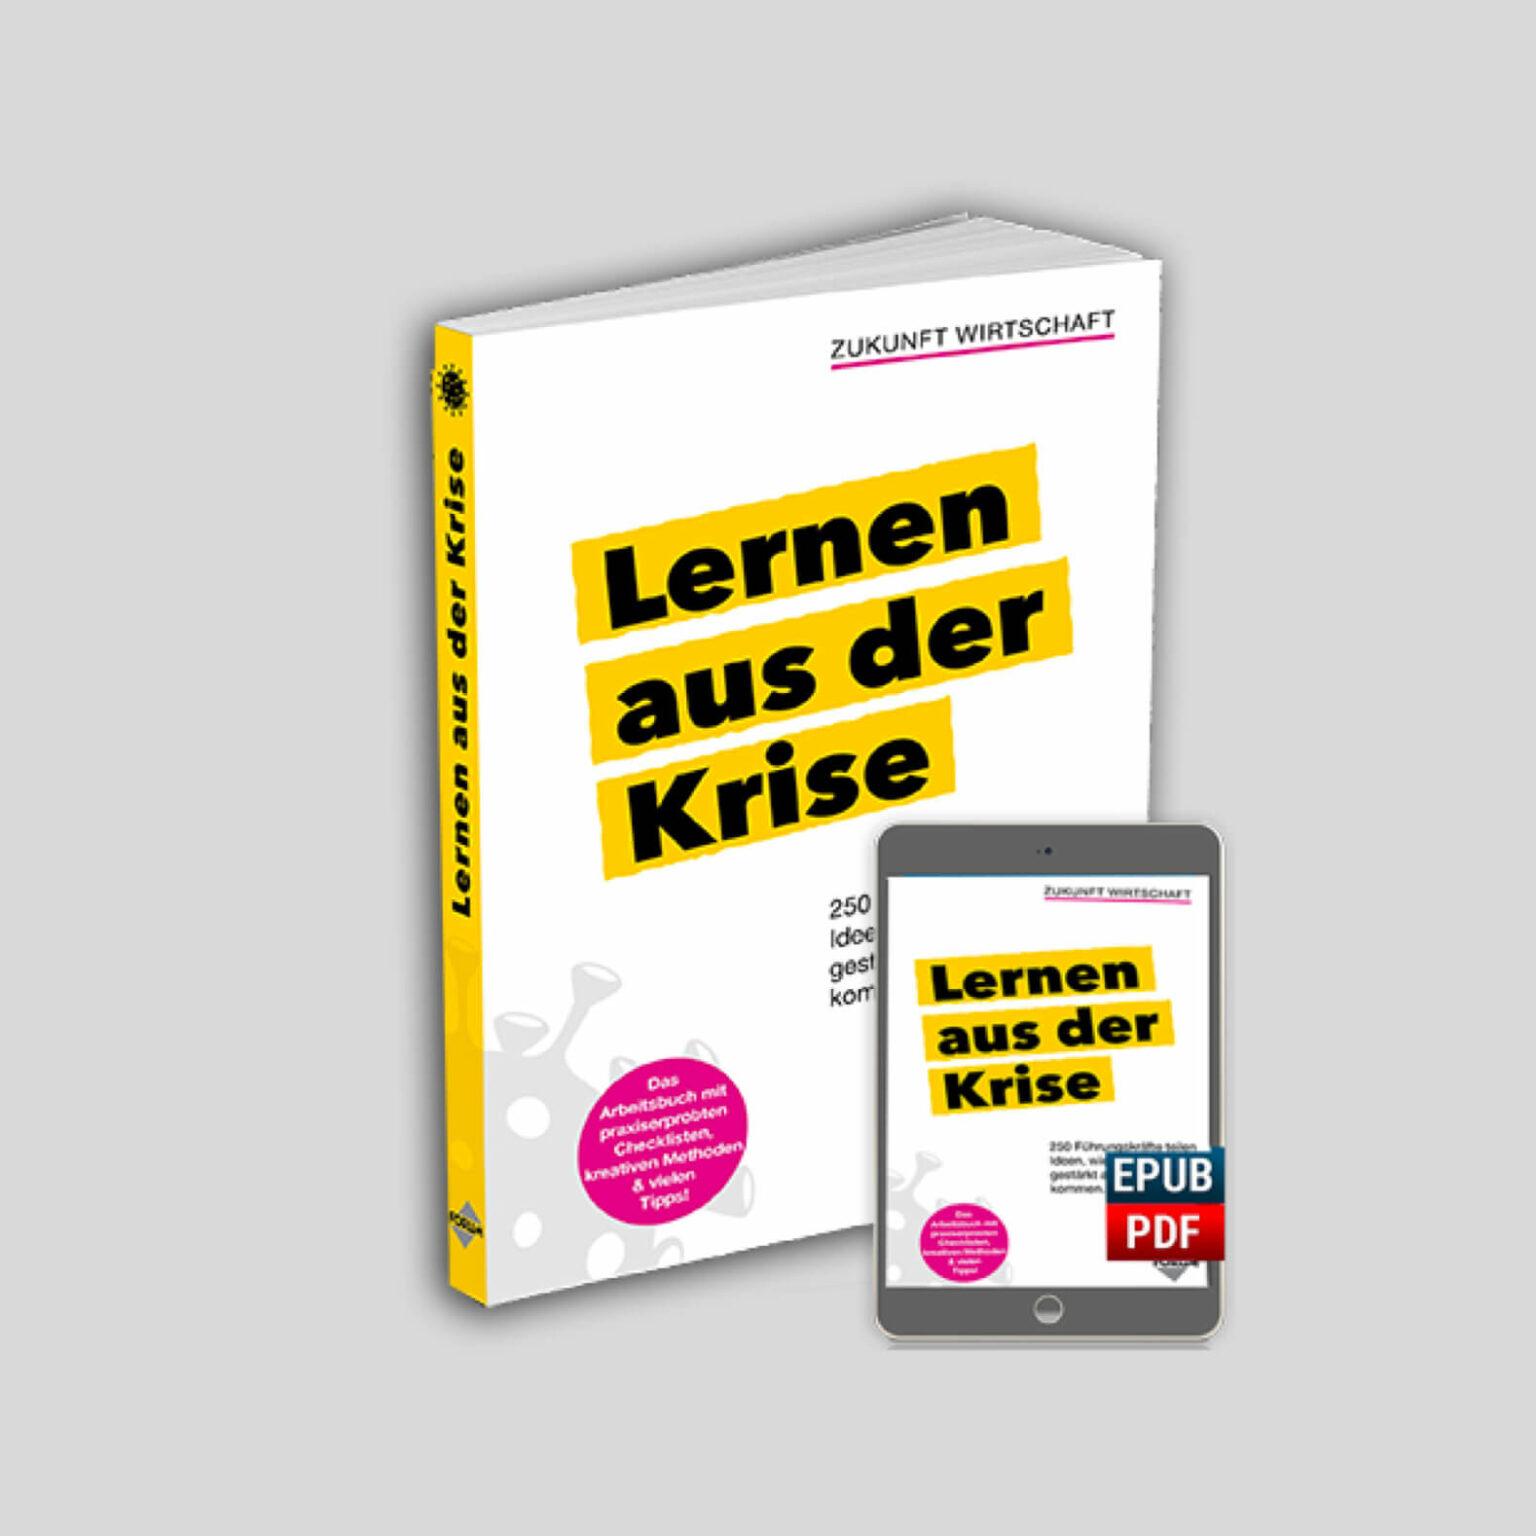 ladk epub book